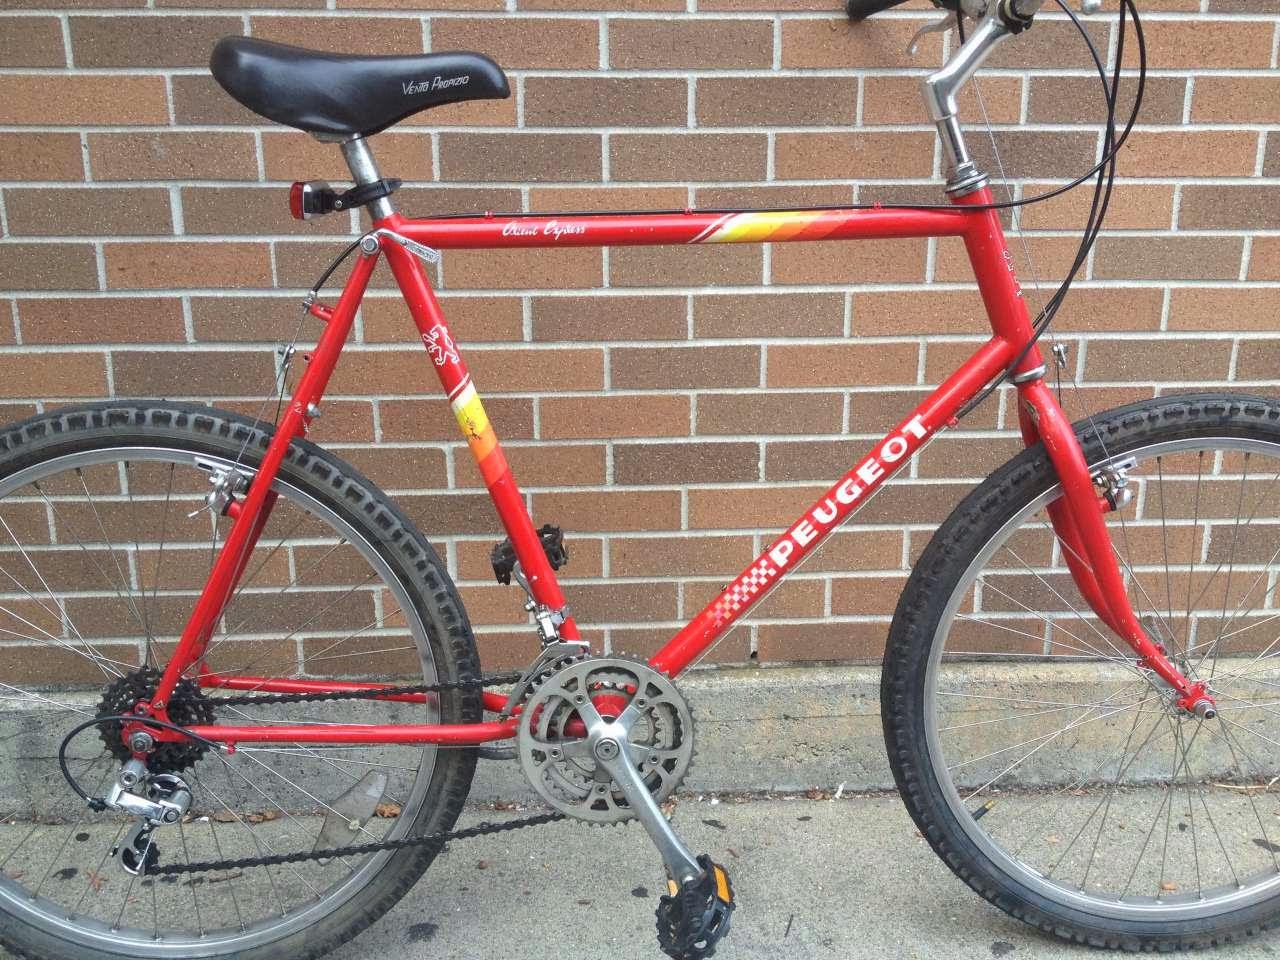 Bike Boom refurbished bikes: Peugeot Orient Express Mountain